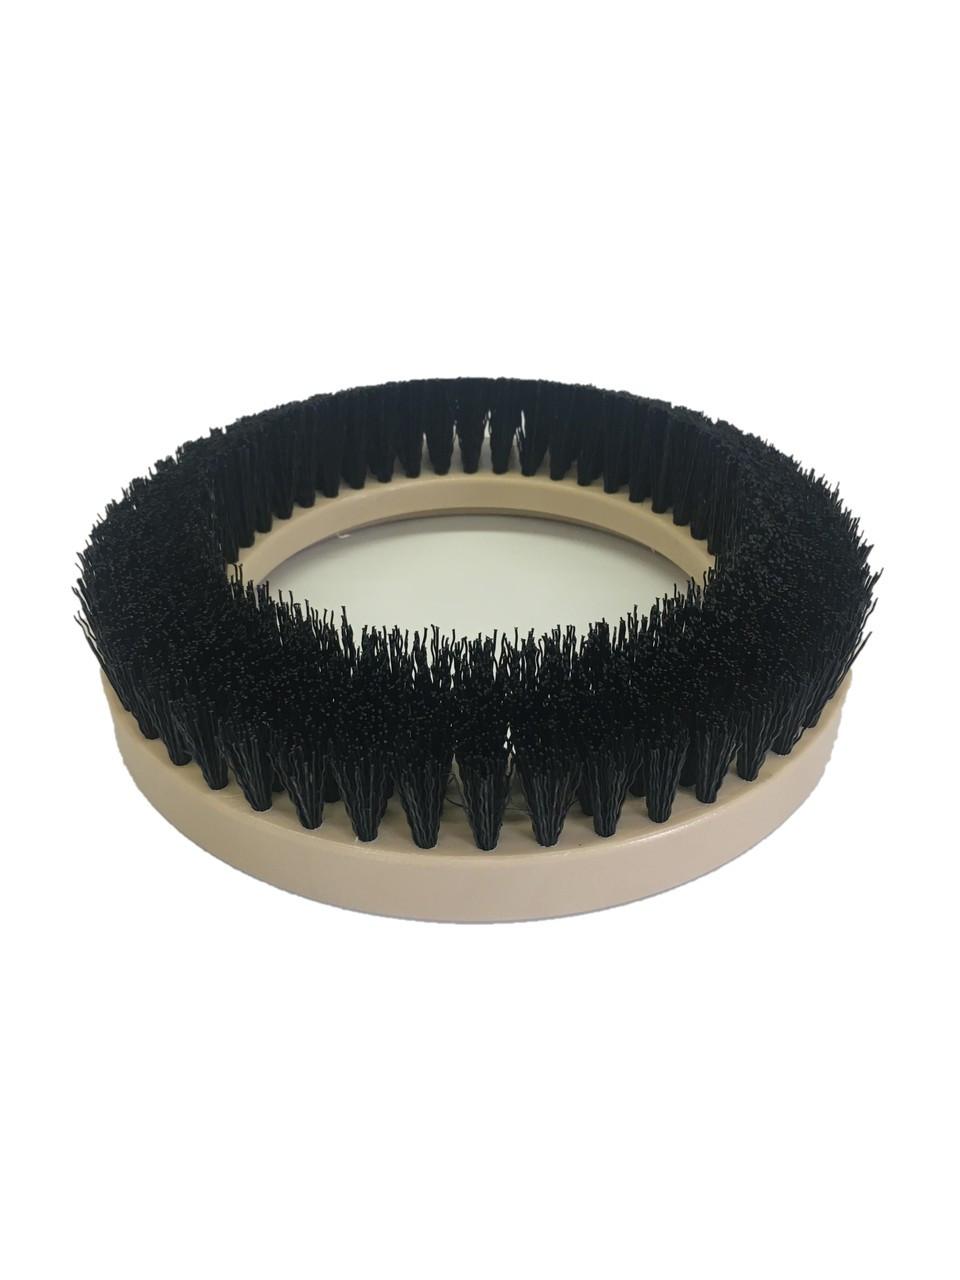 "9"" Flat Medium Brush, Inside Bevel, PolyPro, #2 brush alone"